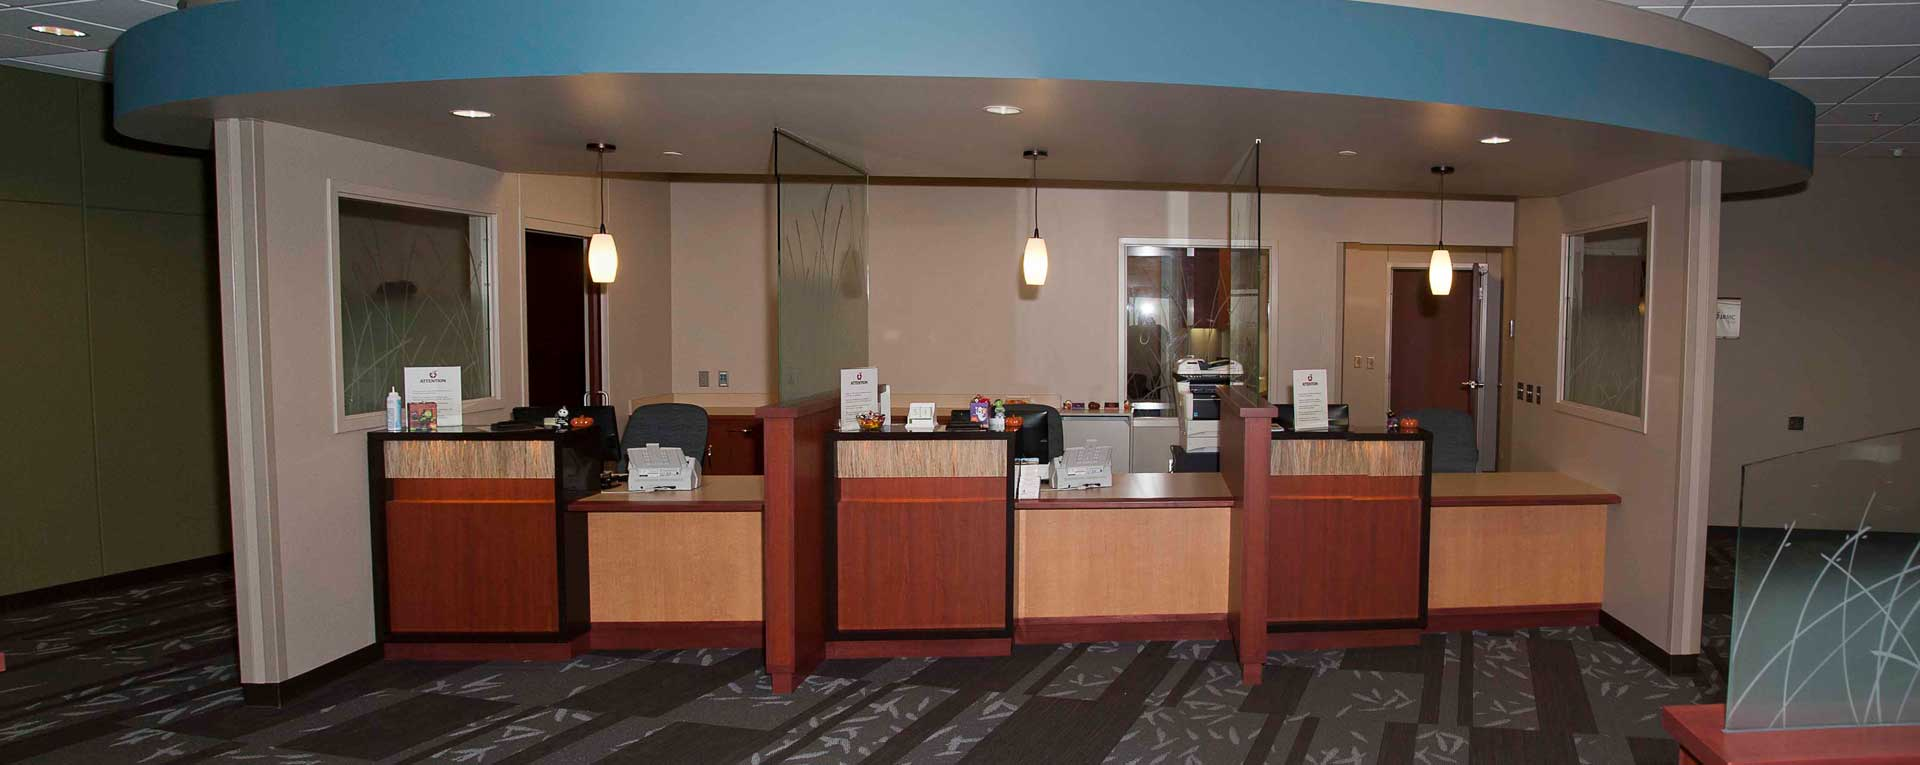 Jamestown Medical Building Lobby